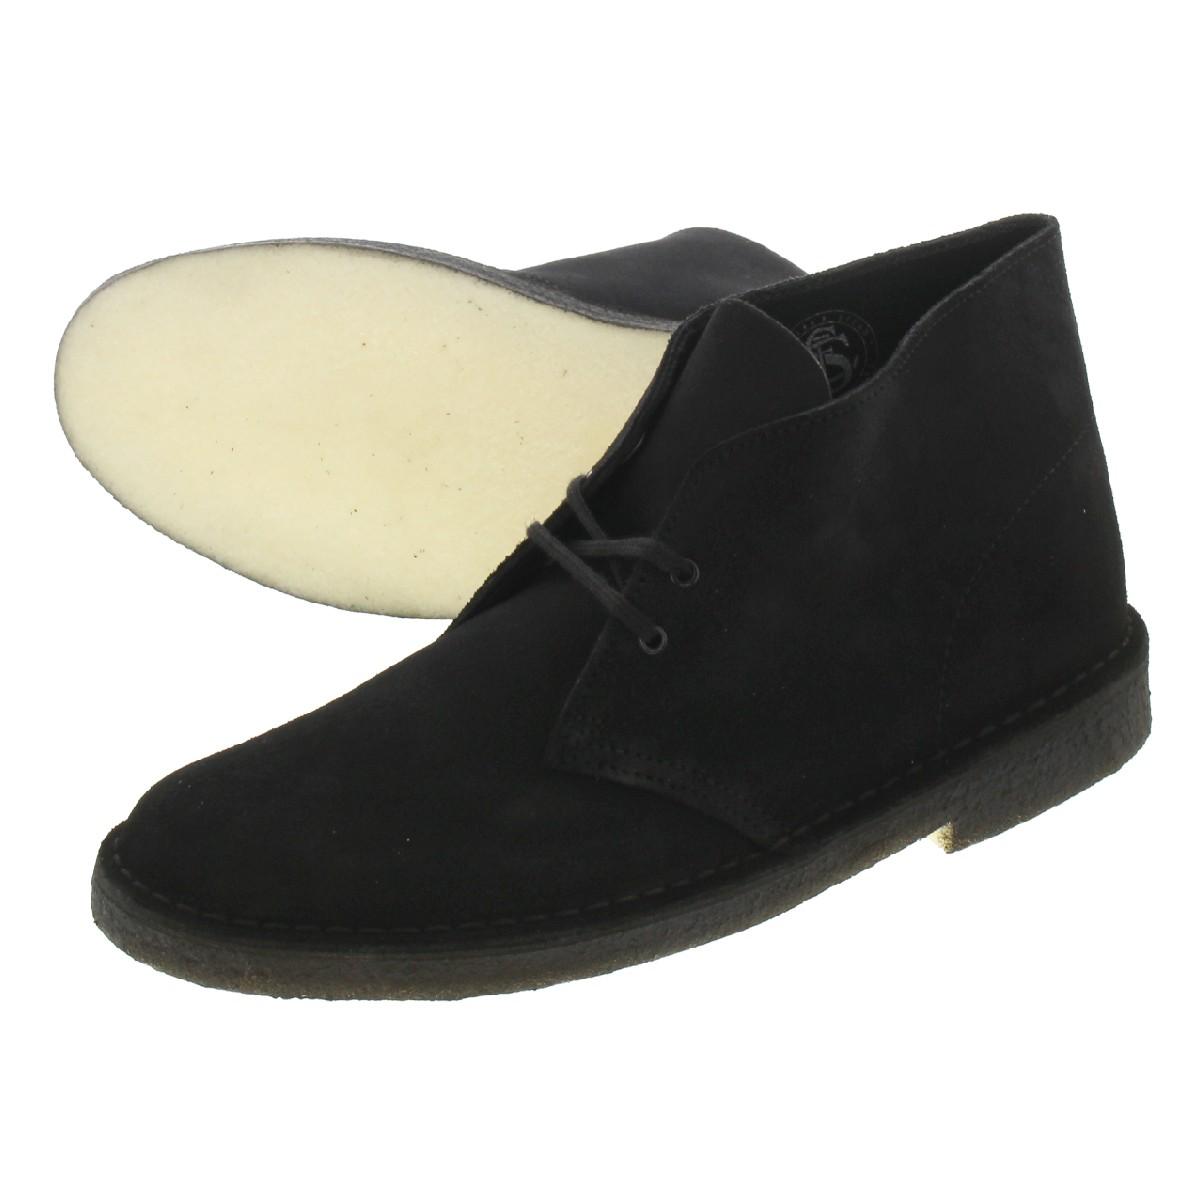 CLARKS DESERT BOOT クラークス デザート ブーツ BLACK SUEDE 26138227